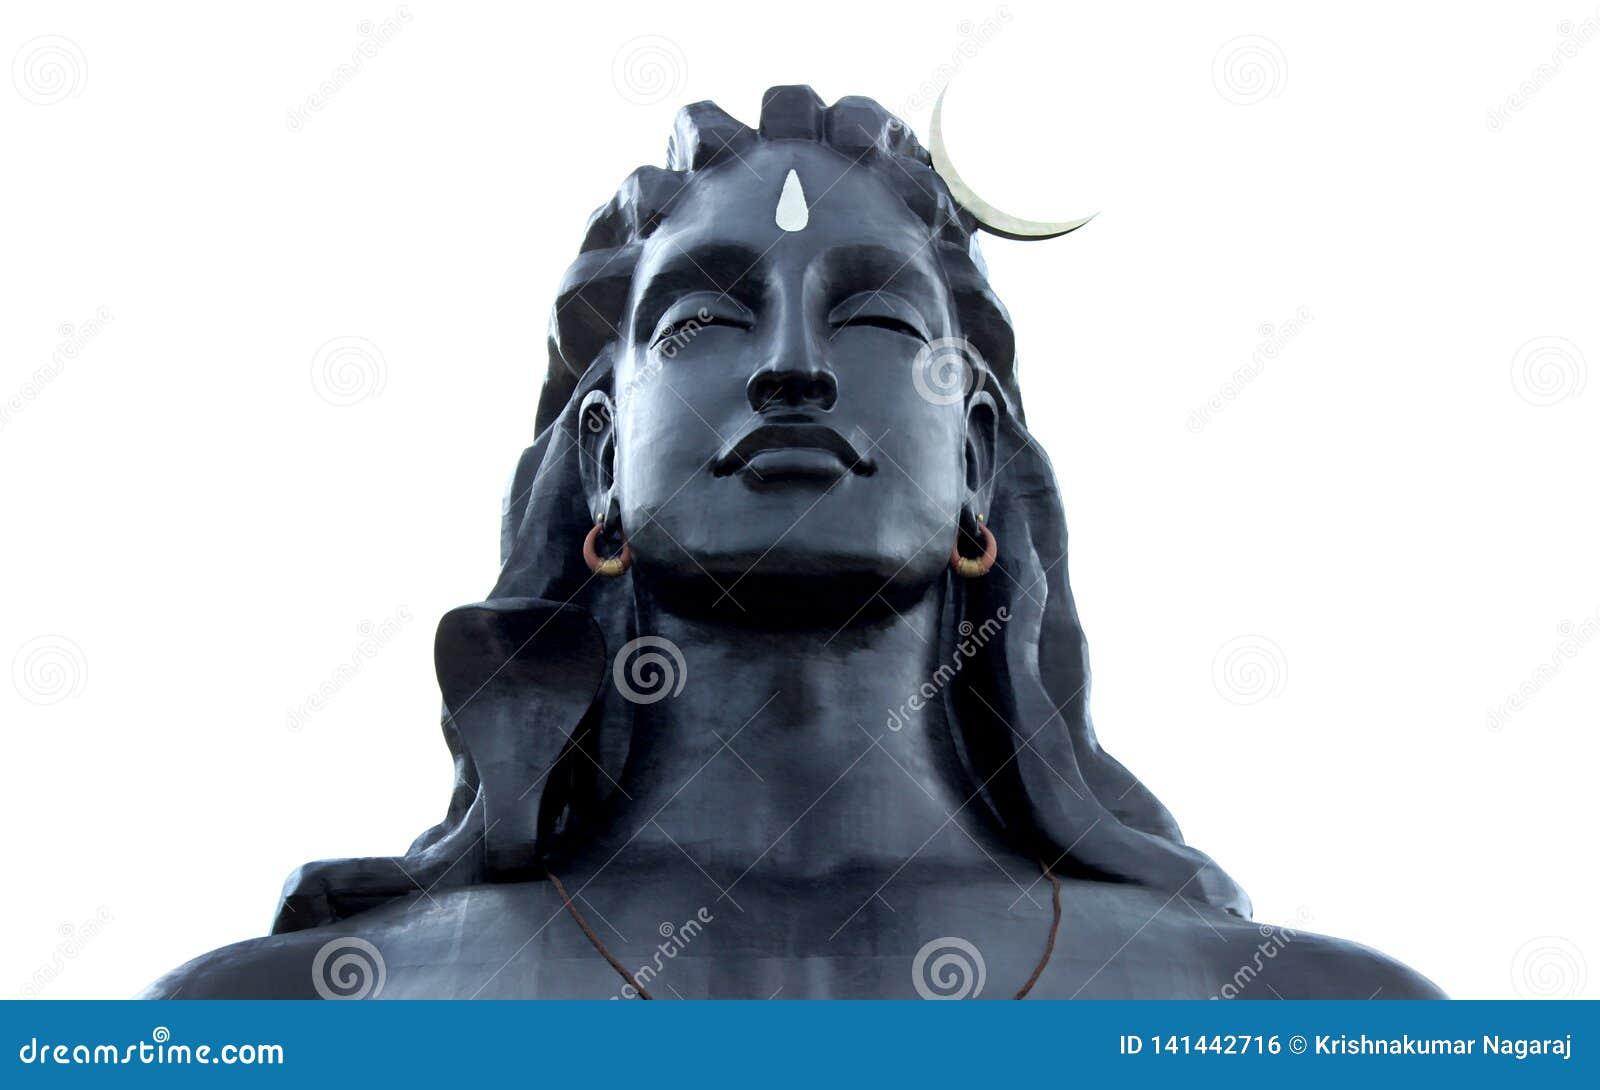 64 adiyogi photos free royalty free stock photos from dreamstime https www dreamstime com adiyogi shiva temple built isha foundation coimbatore india metre tall statue designed sadhguru jaggi vasudev image141442716